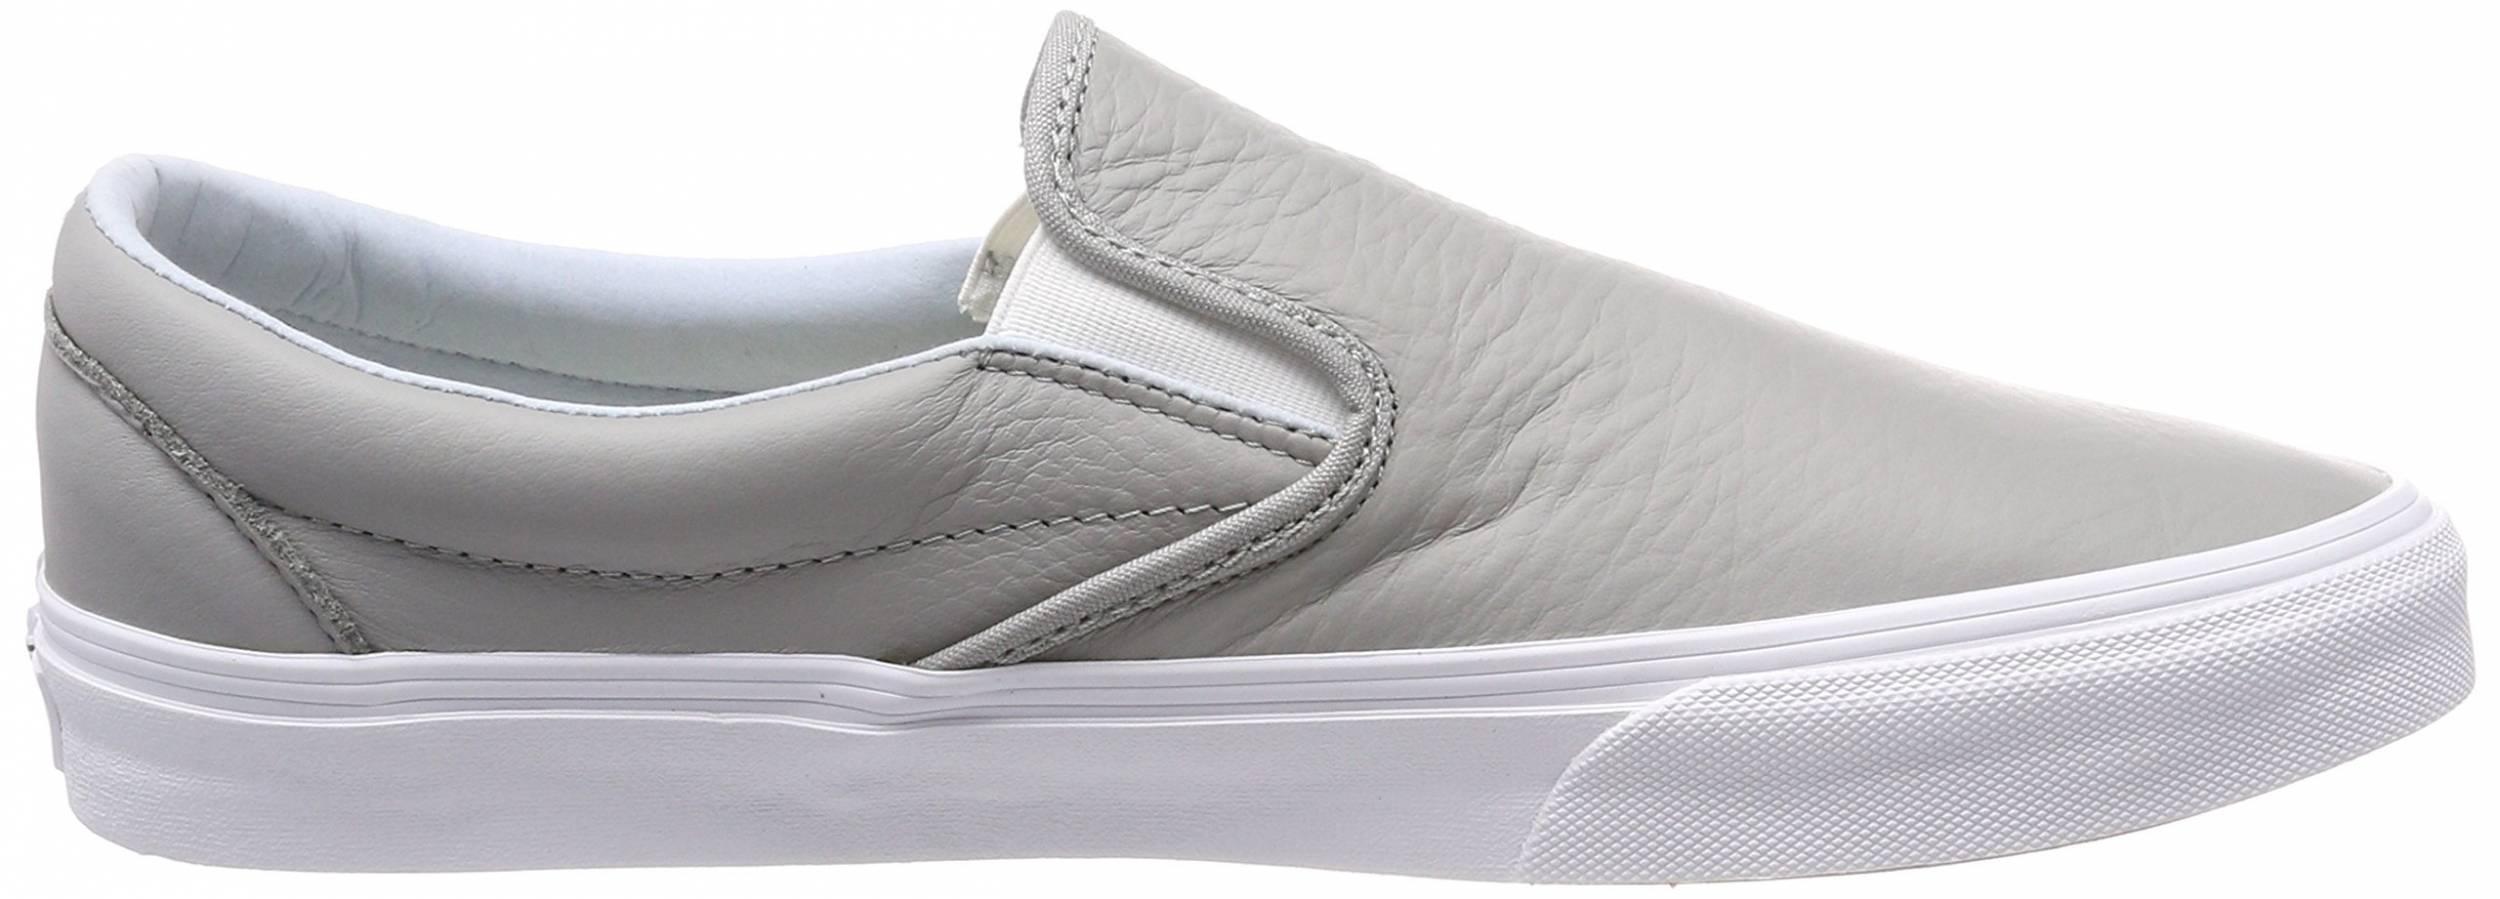 Vans Leather Slip-On